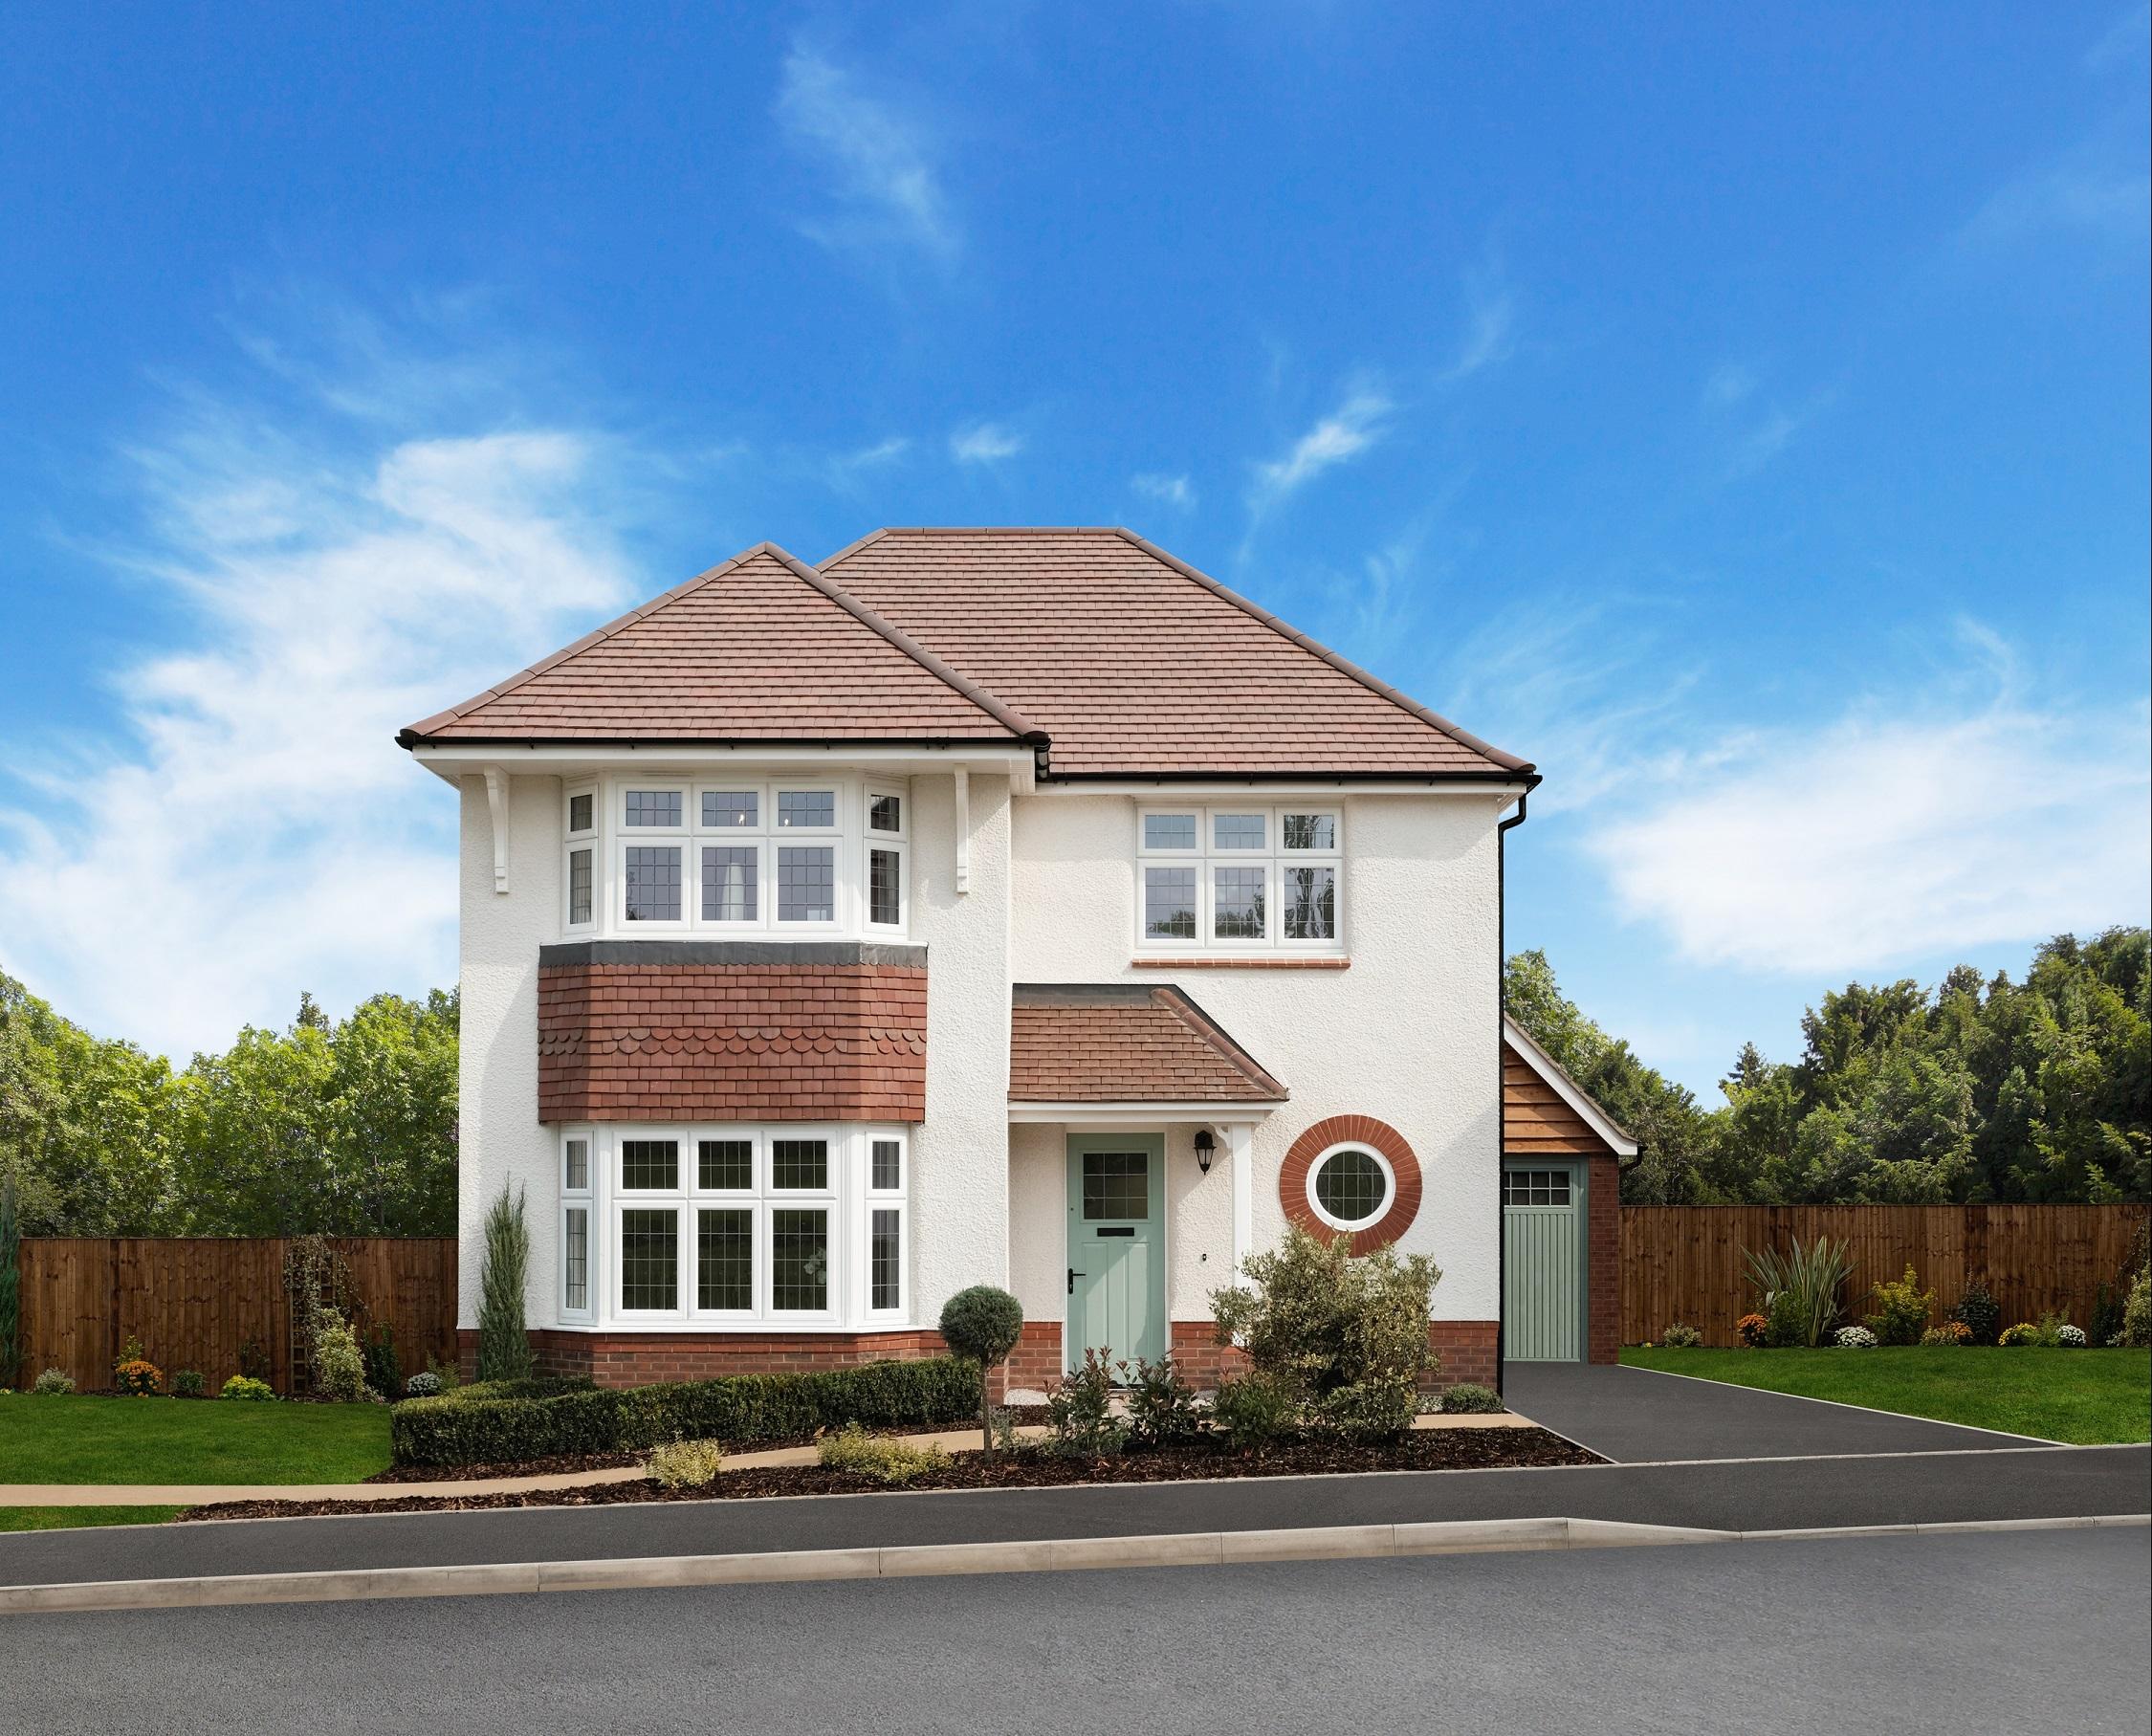 Housebuilder expands into Nottinghamshire